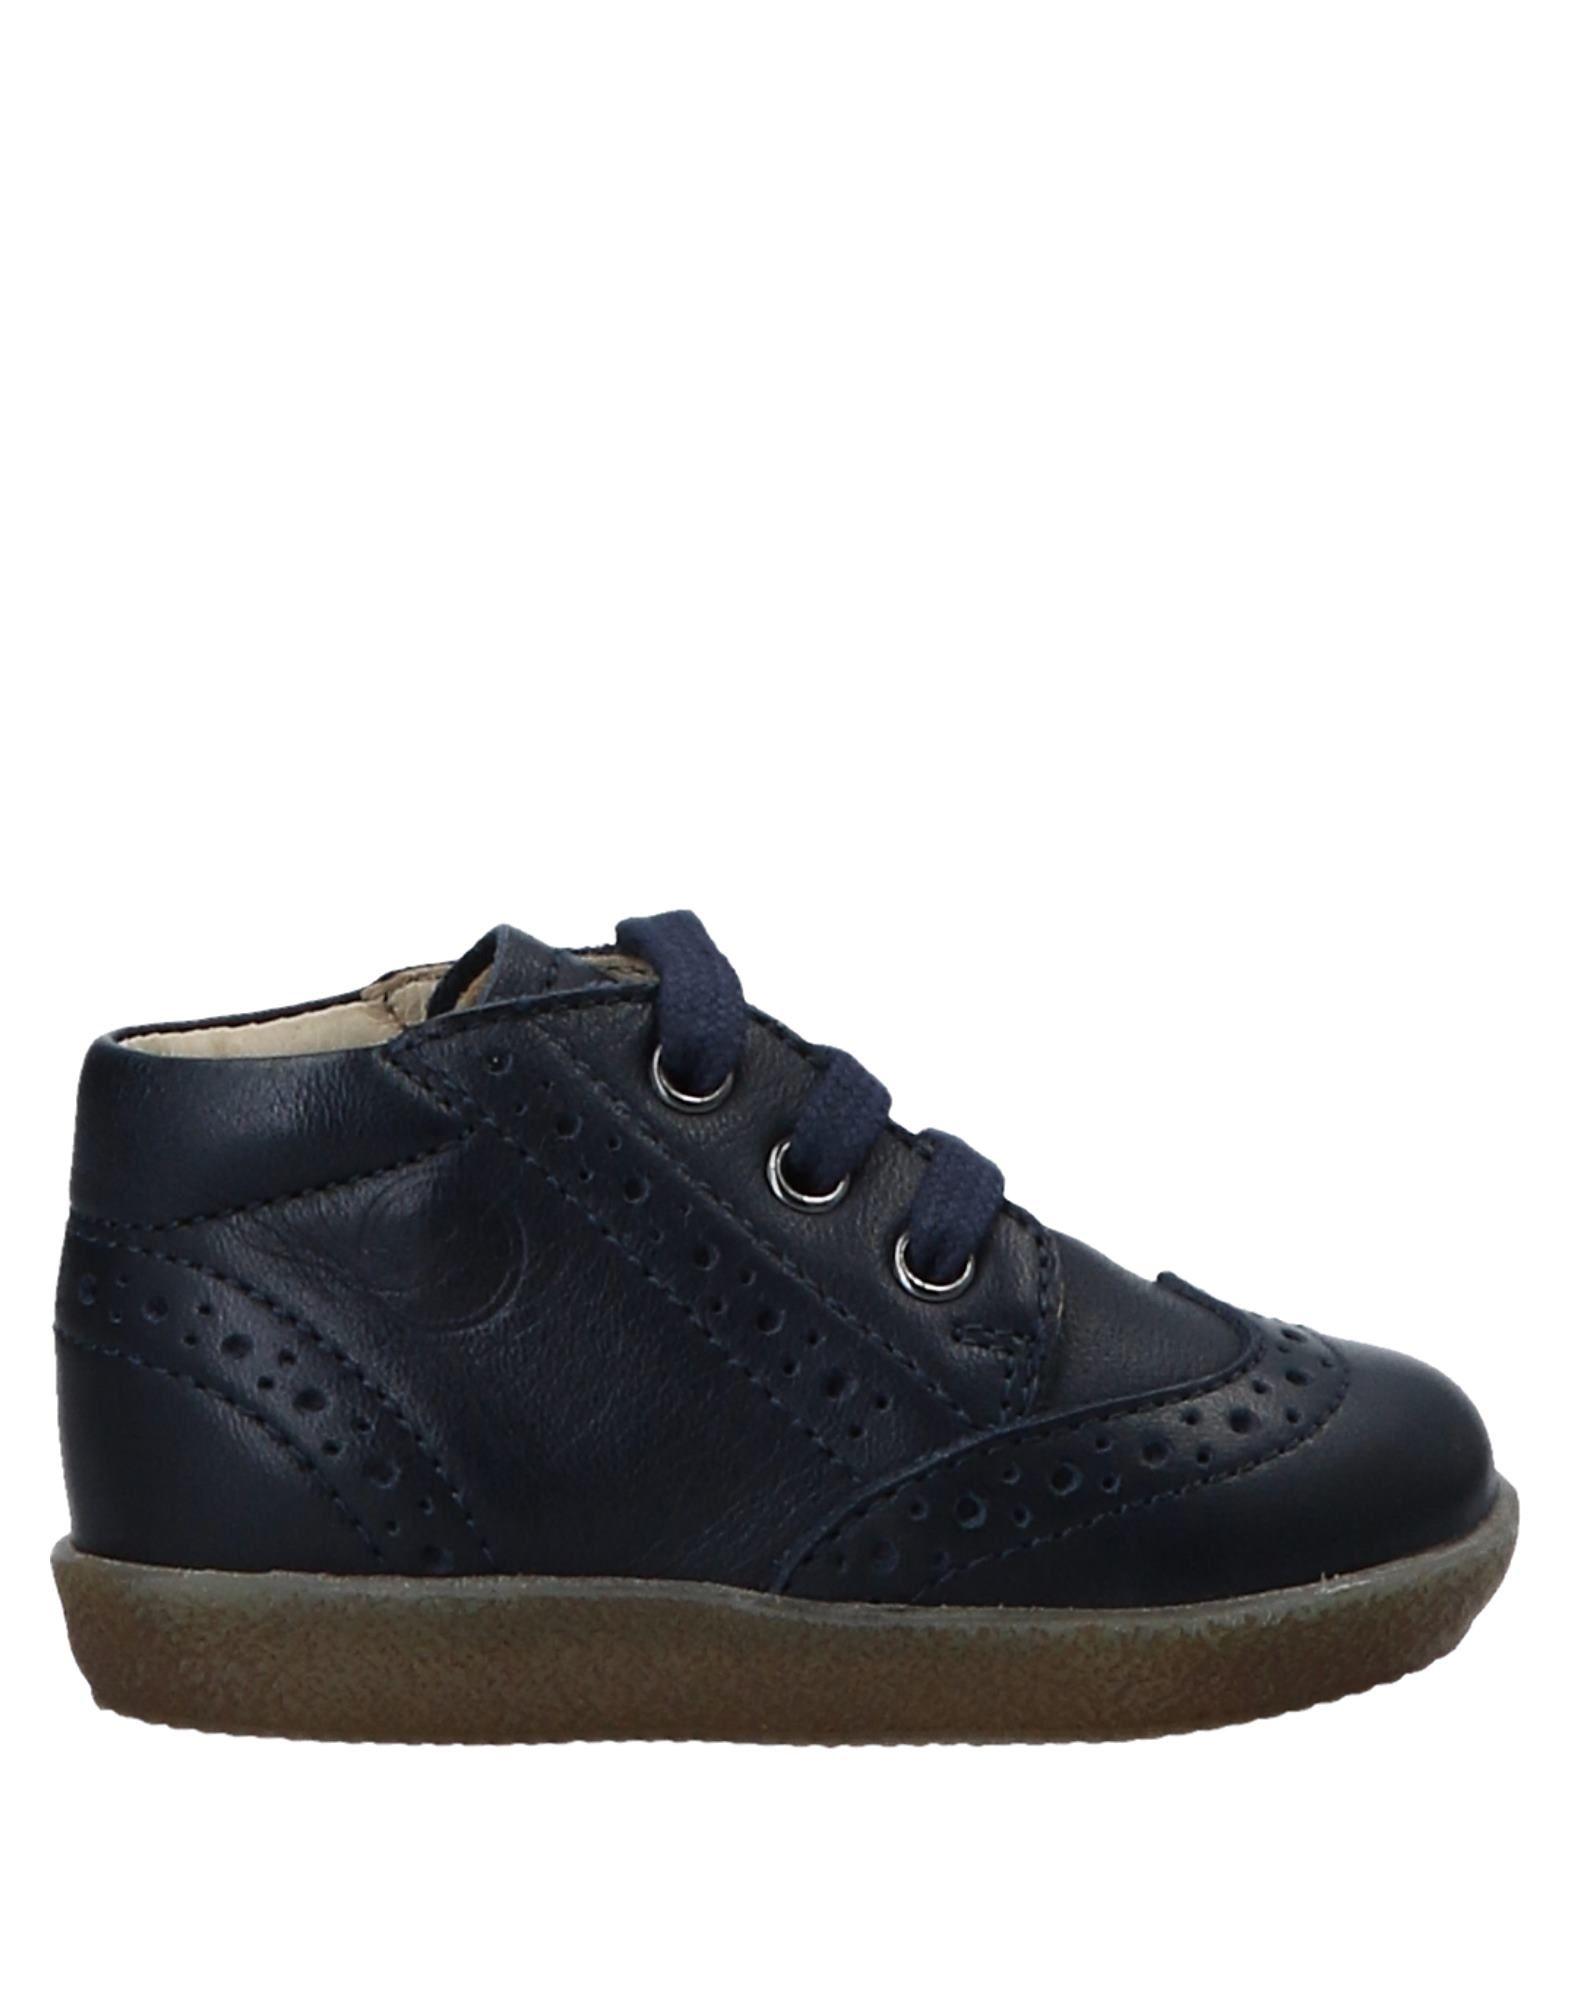 FALCOTTO Обувь на шнурках первый внутри обувь обувь обувь обувь обувь обувь обувь обувь обувь 8a2549 мужская армия green 40 метров